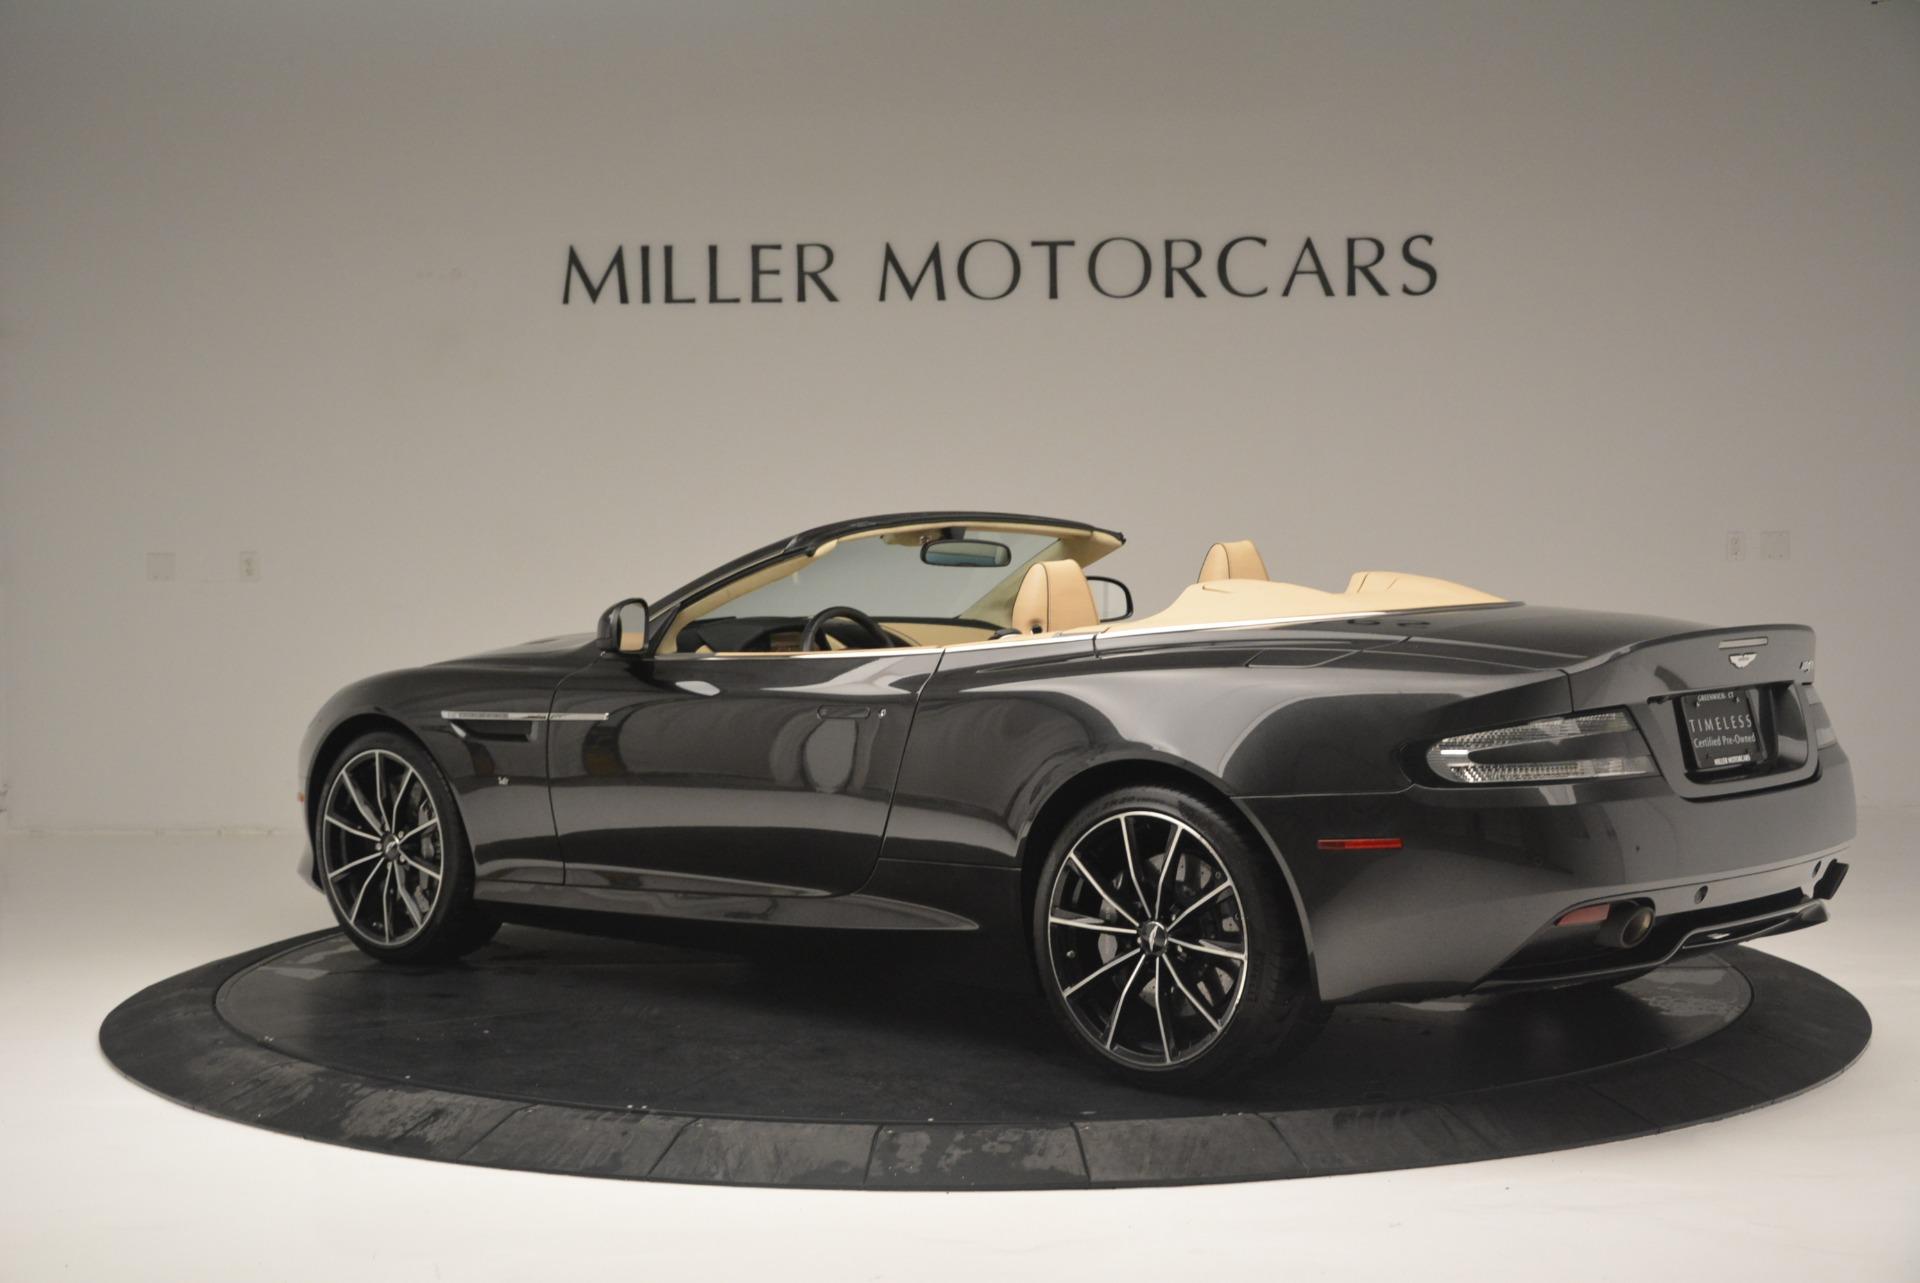 Used 2016 Aston Martin DB9 GT Volante For Sale In Greenwich, CT 2429_p4